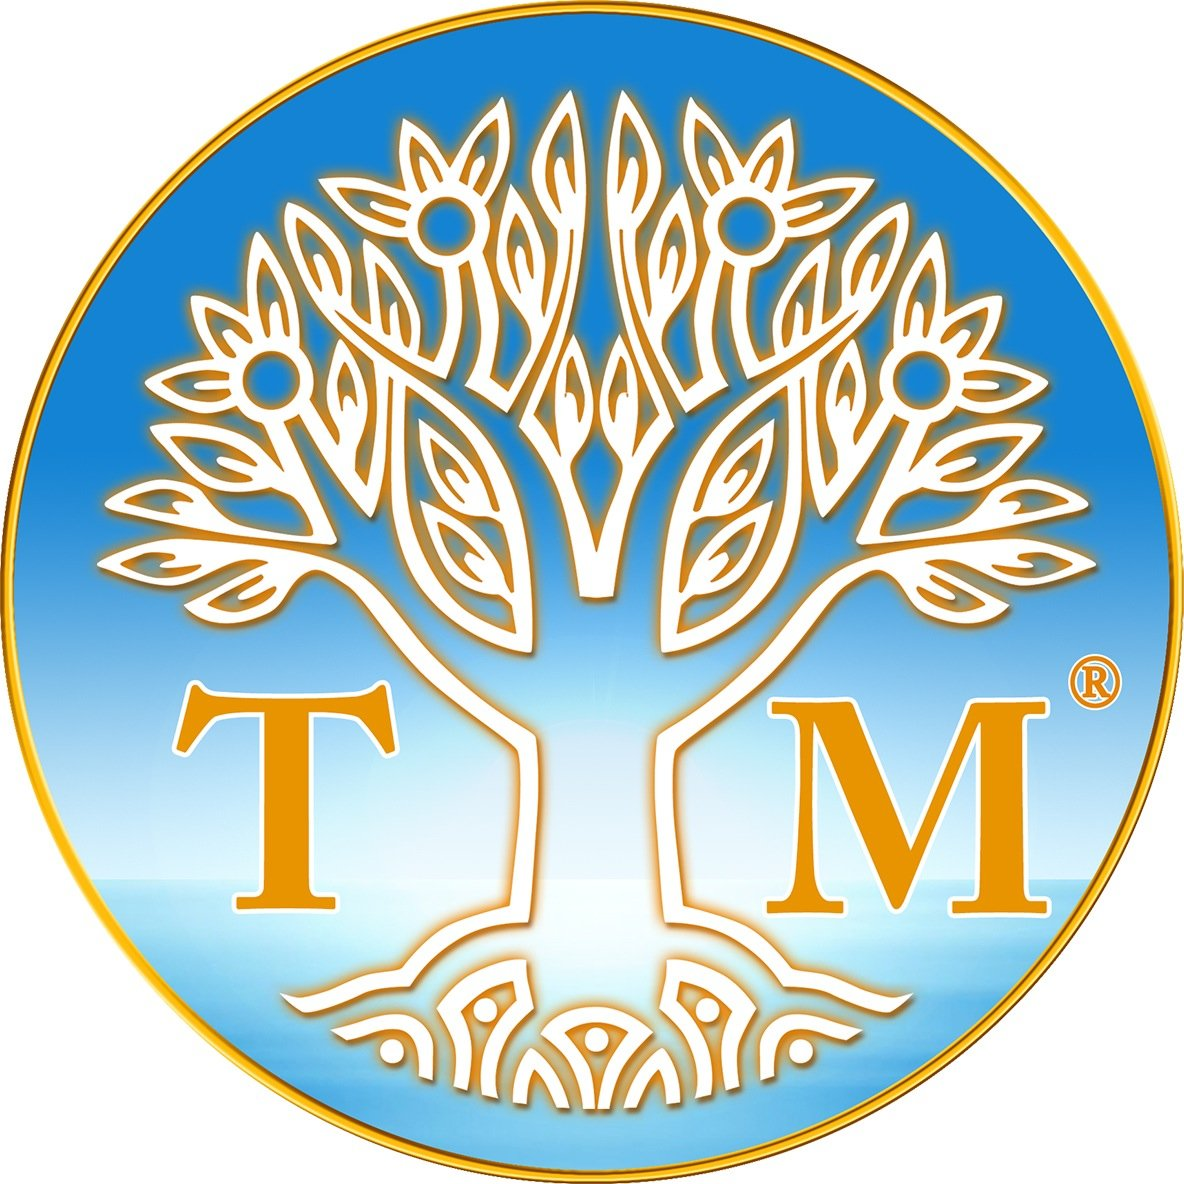 Tm meditation techniques 8th